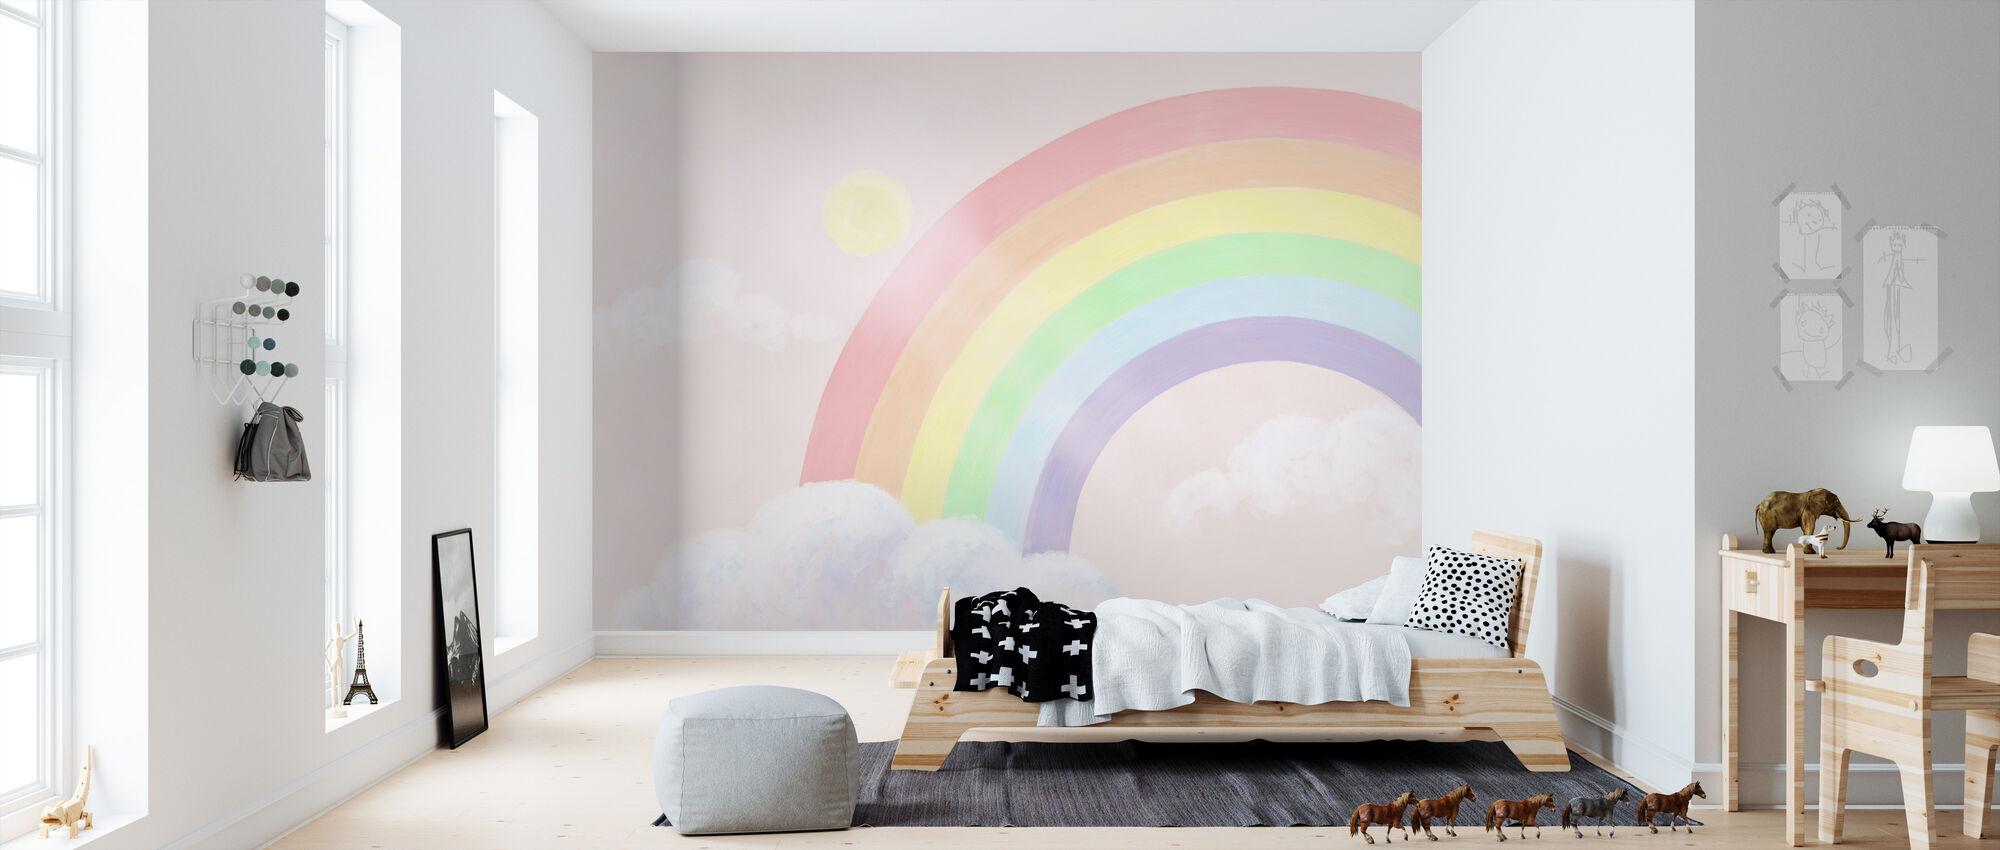 Sparkling Rainbow III - Wallpaper - Kids Room